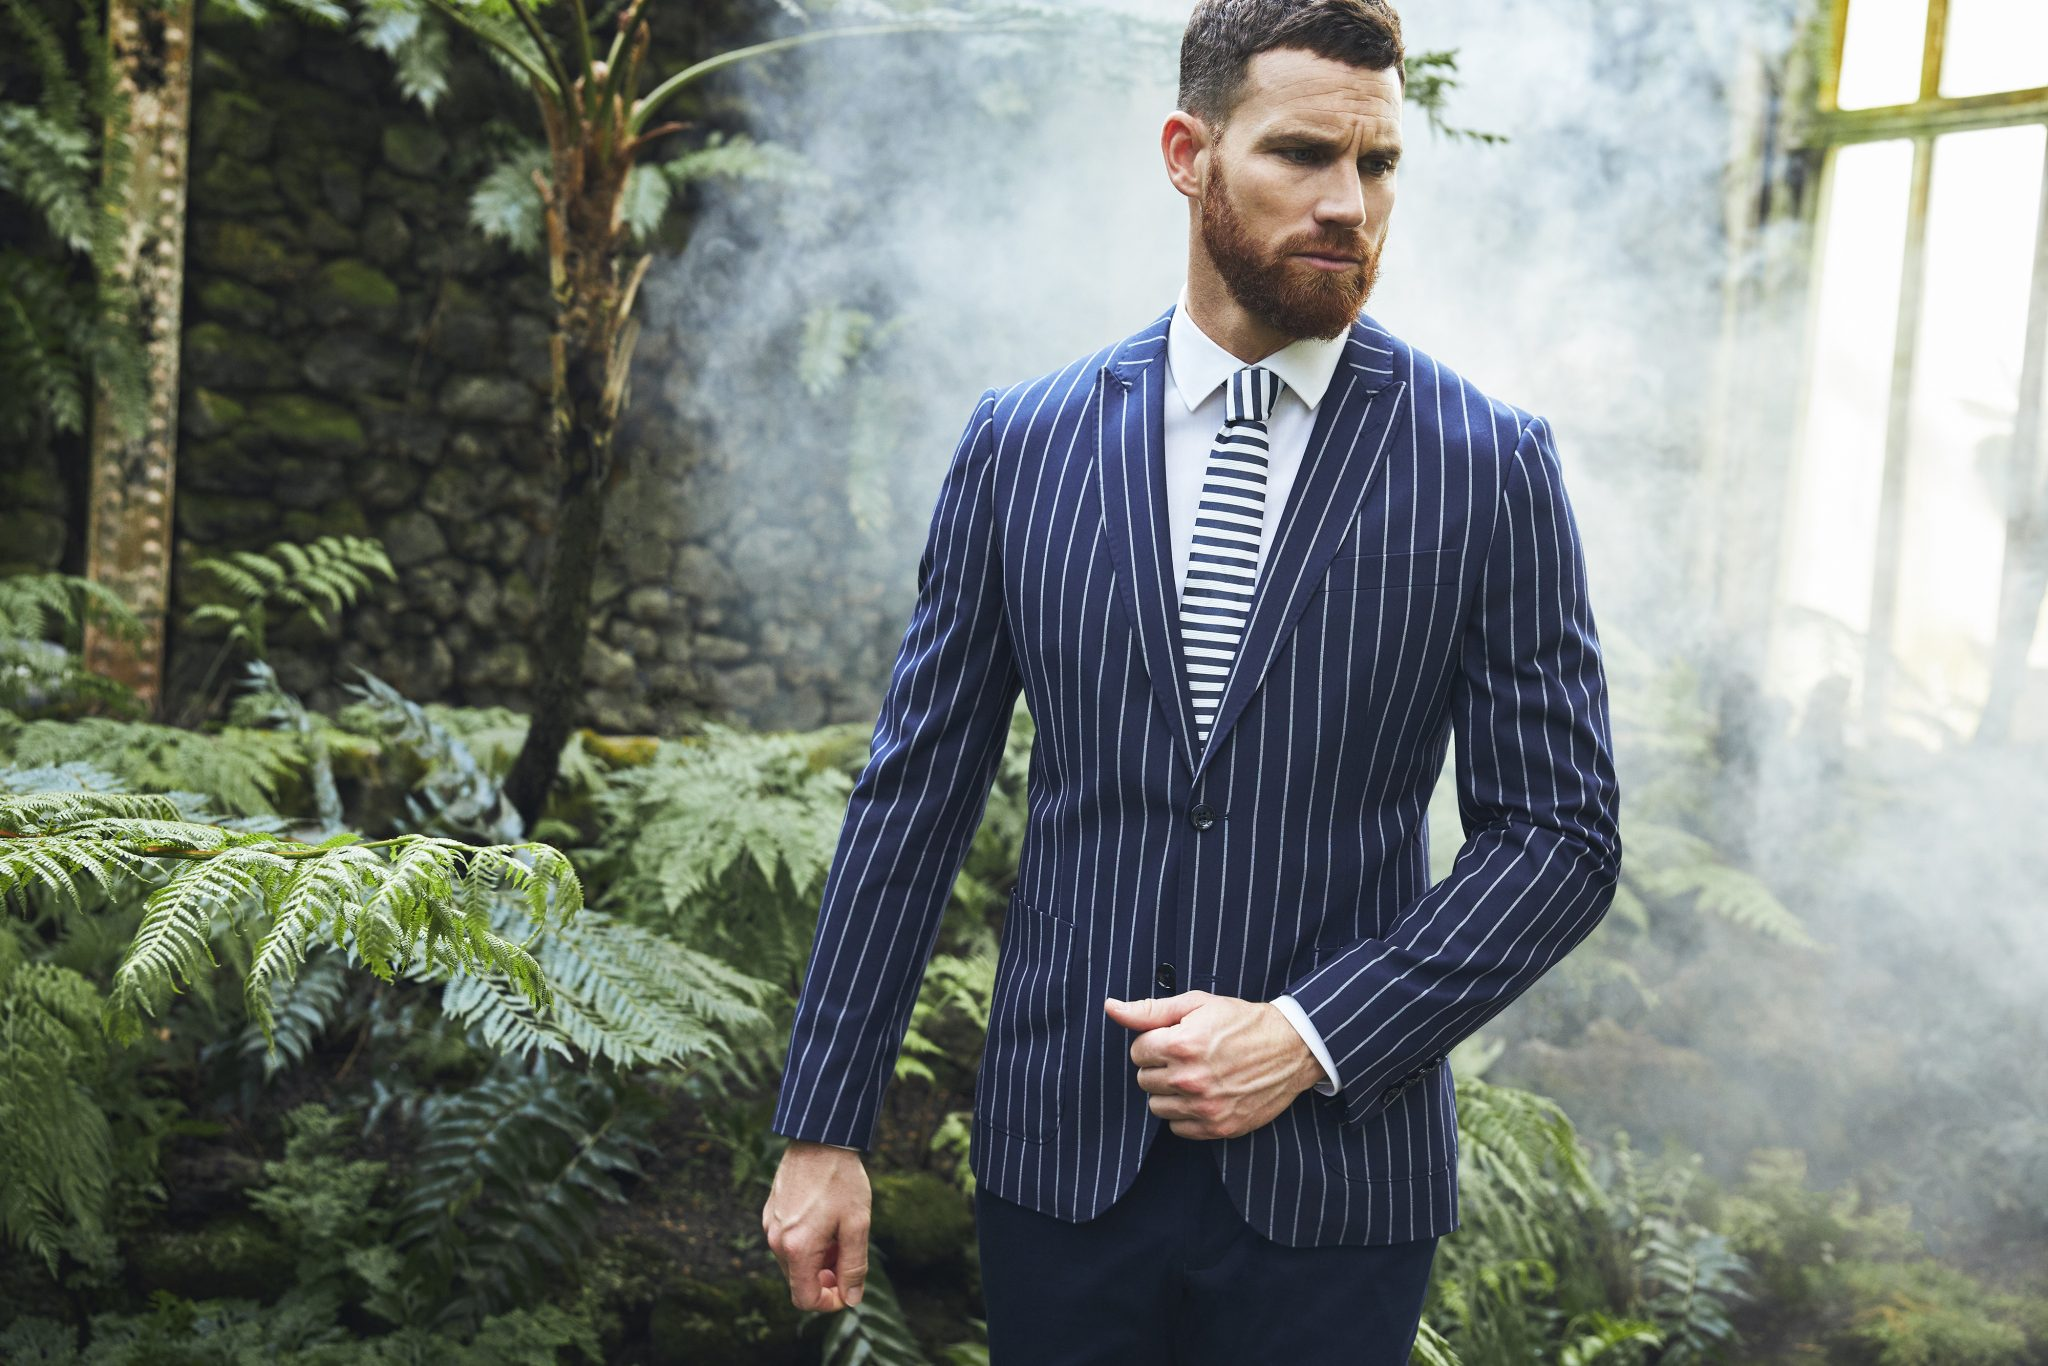 male model wearing a suit in a greenhouse